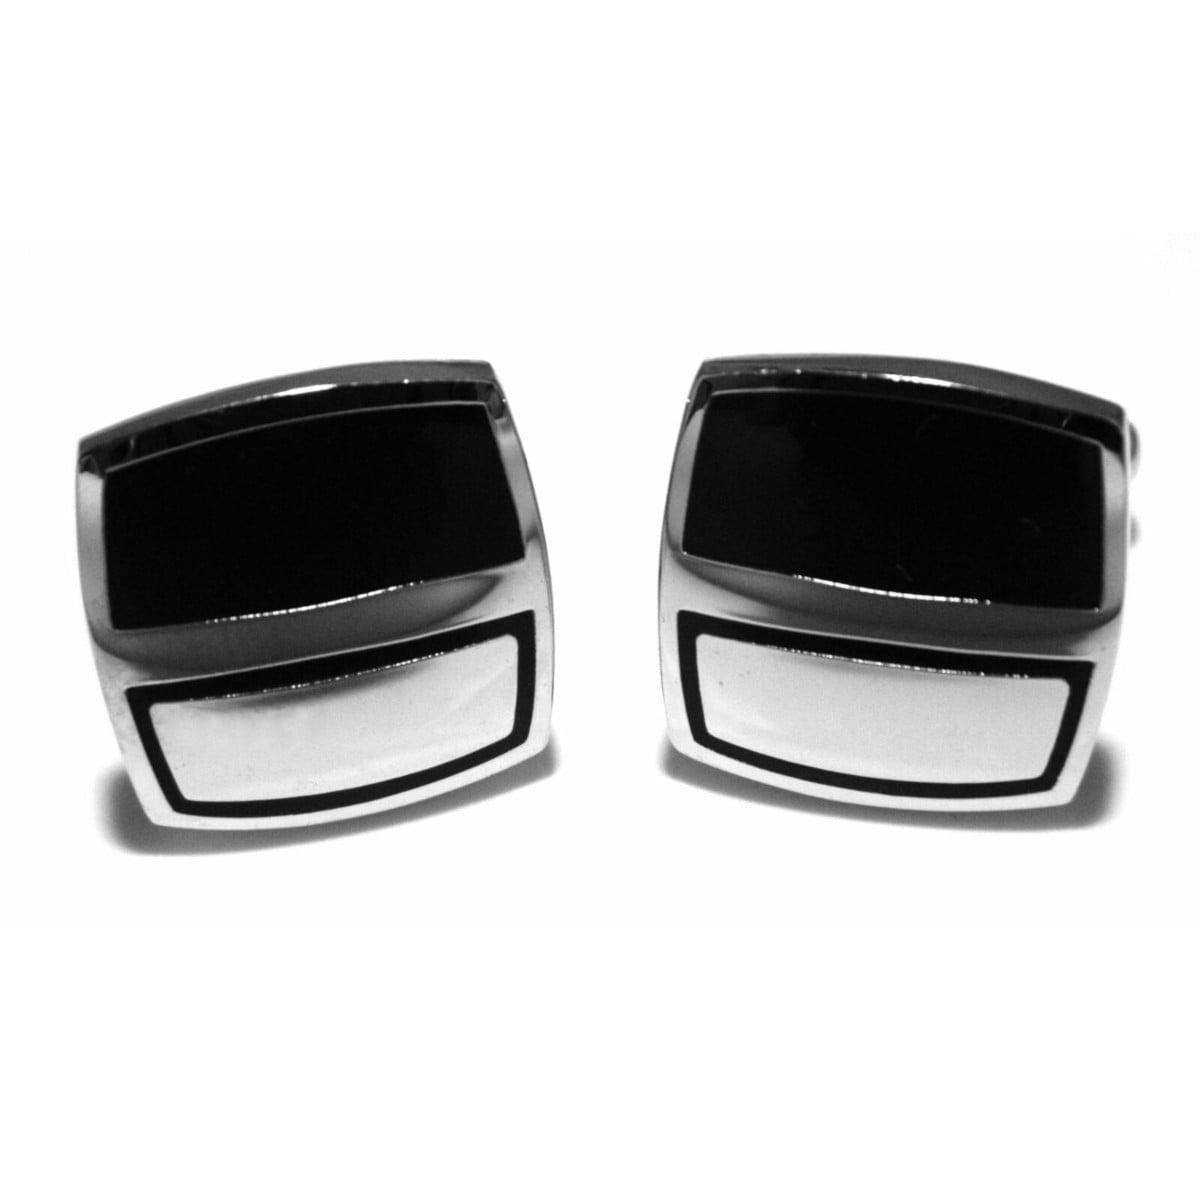 Gents silver plated cufflink set